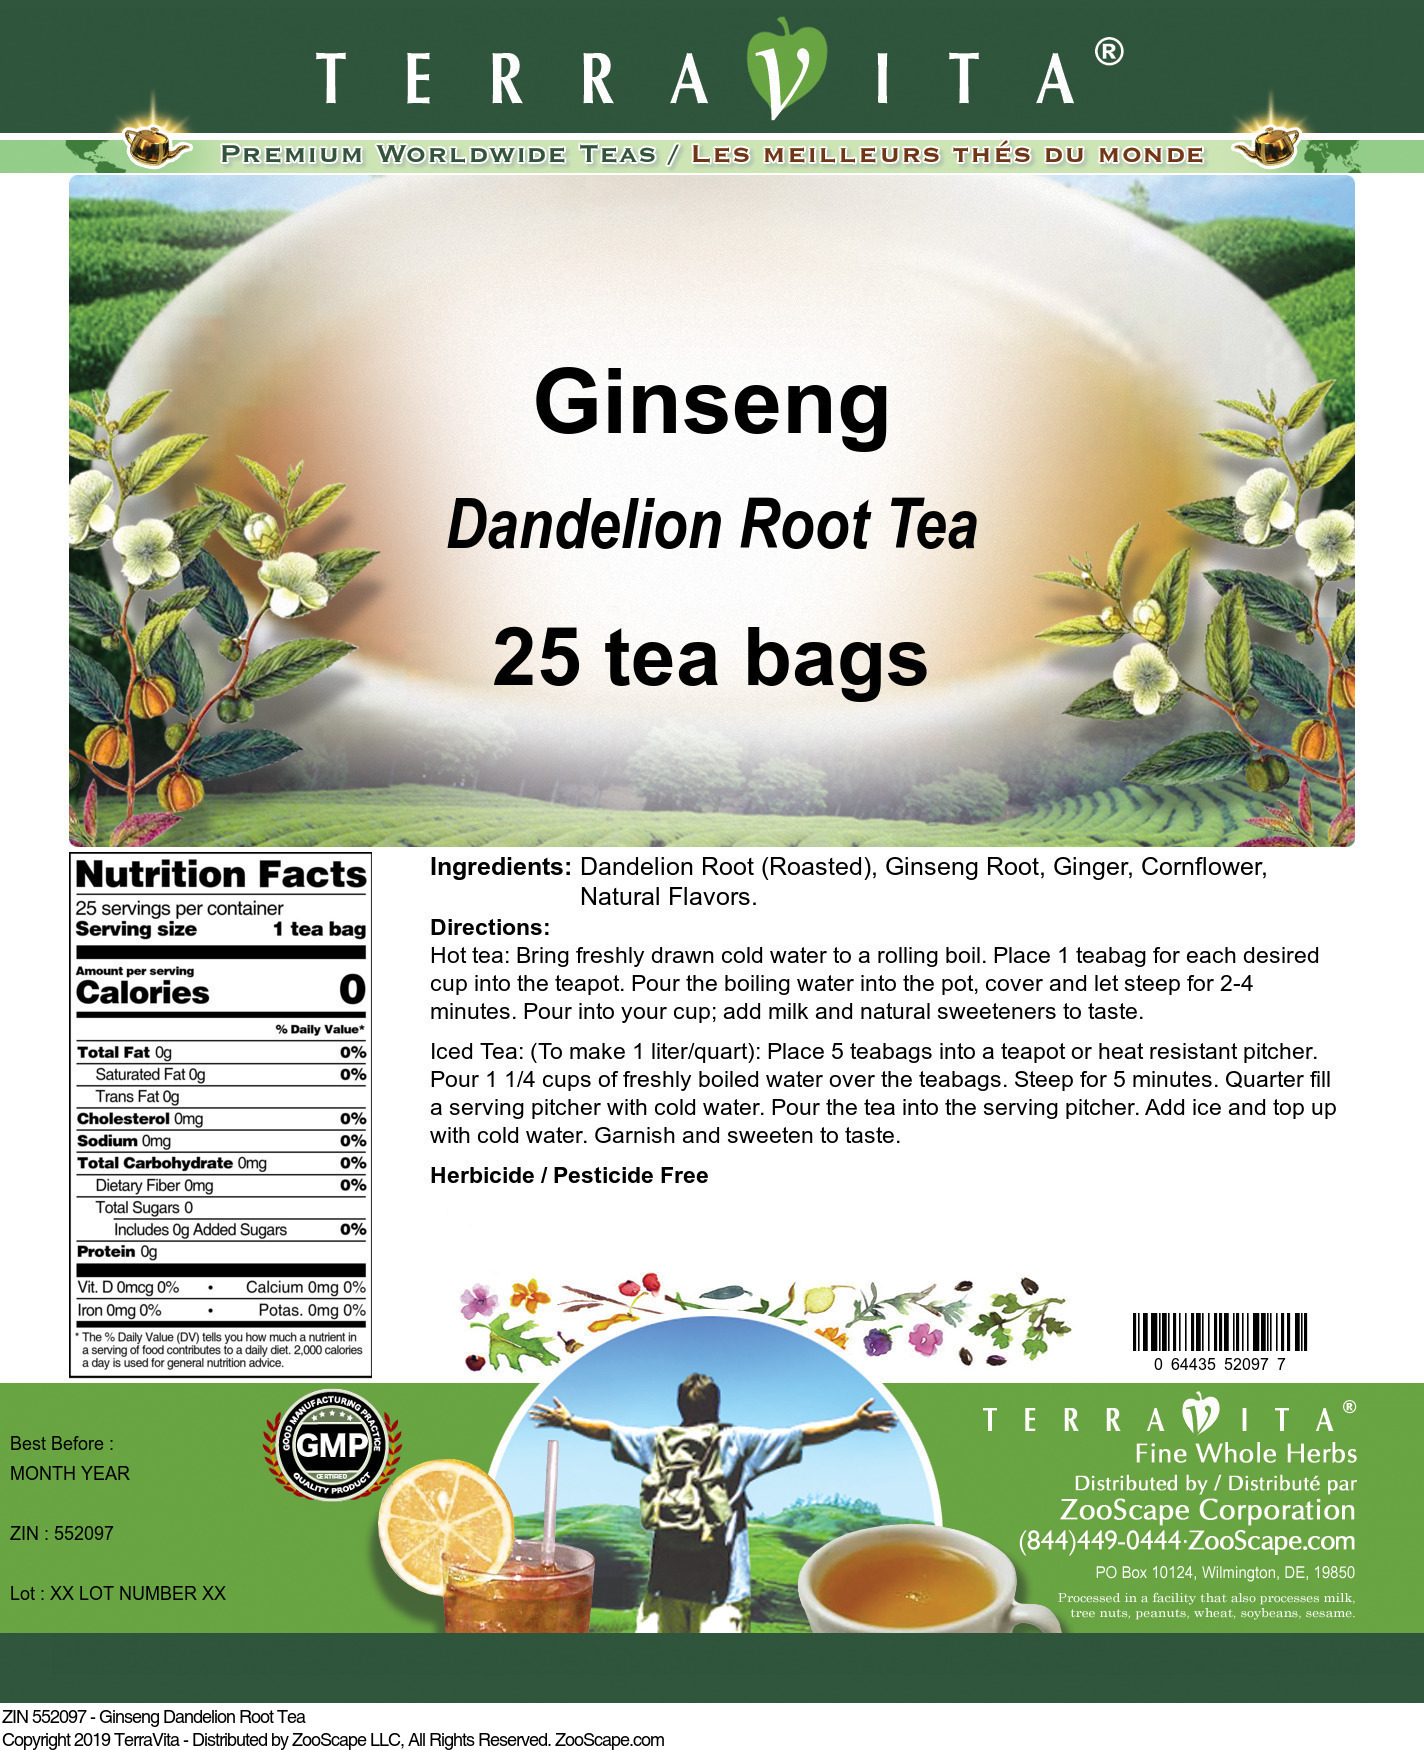 Ginseng Dandelion Root